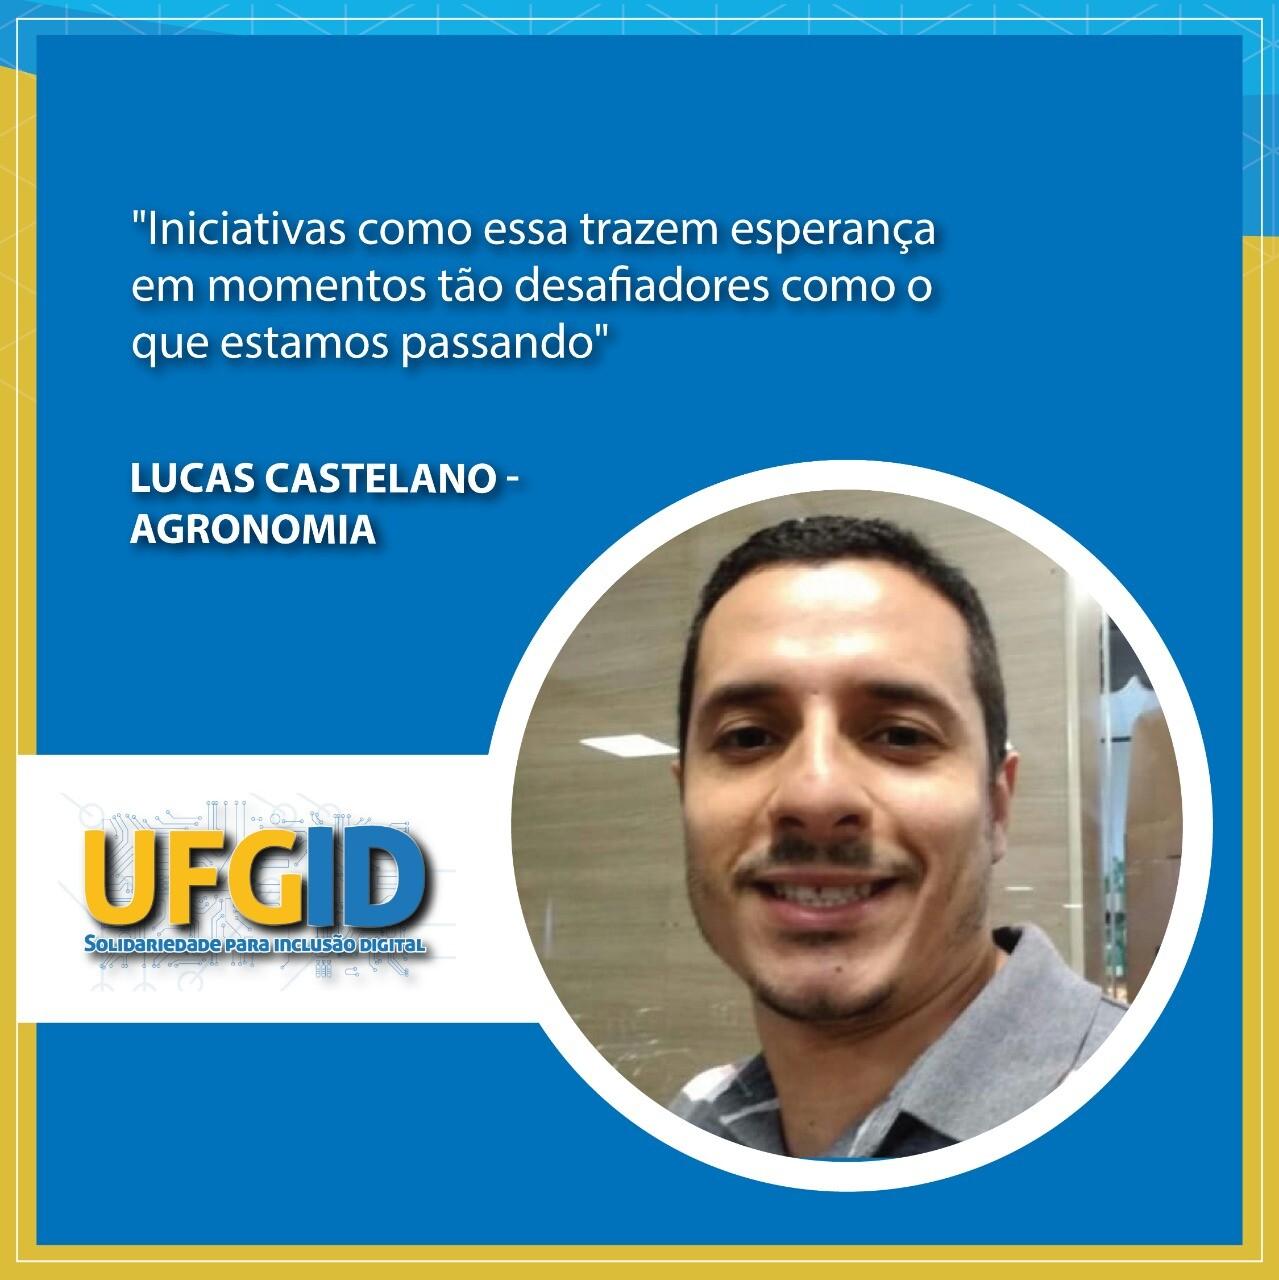 UFGID_03.jpg